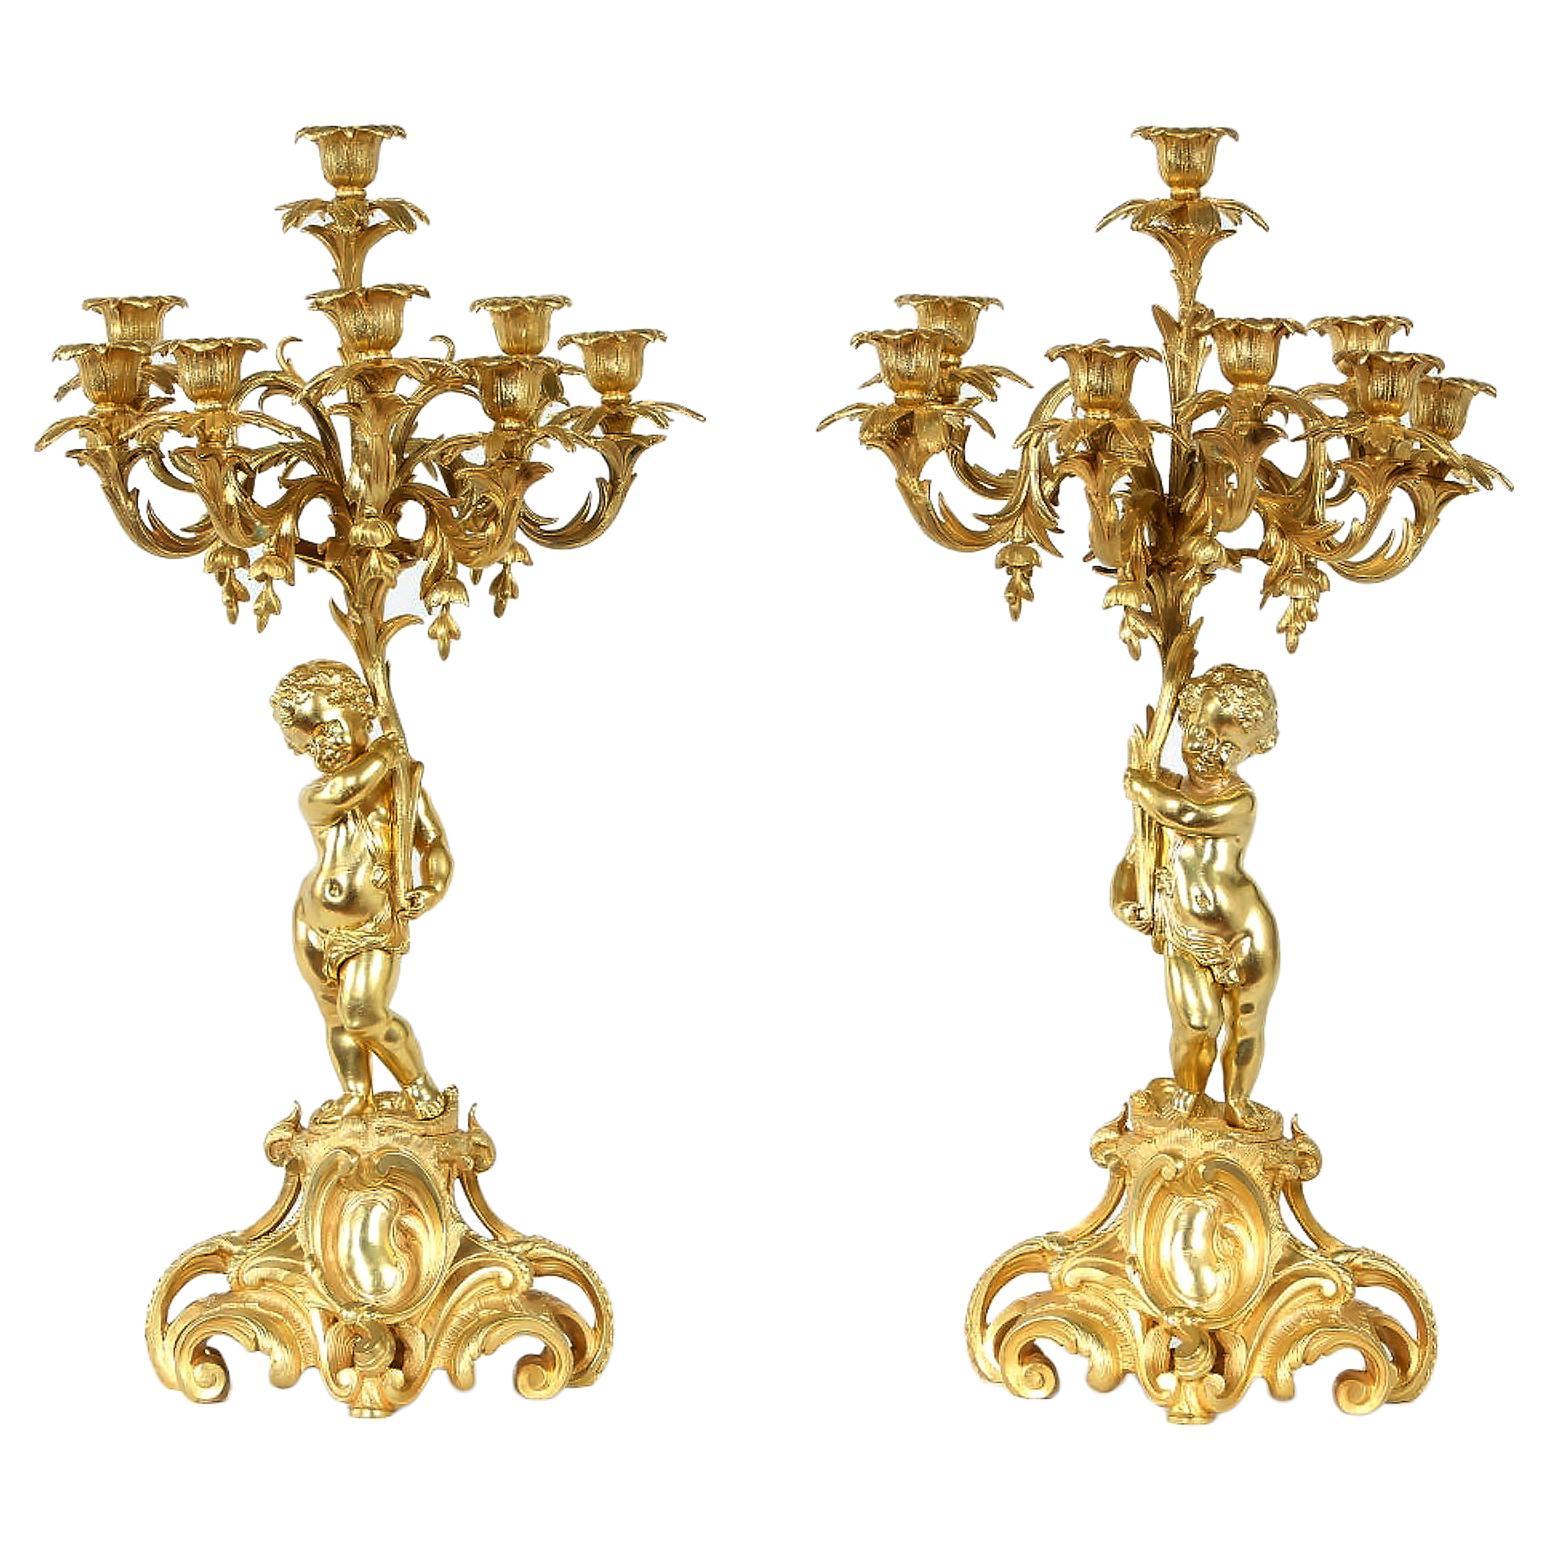 Pair Eight Armed Gilt Bronze Candelabras